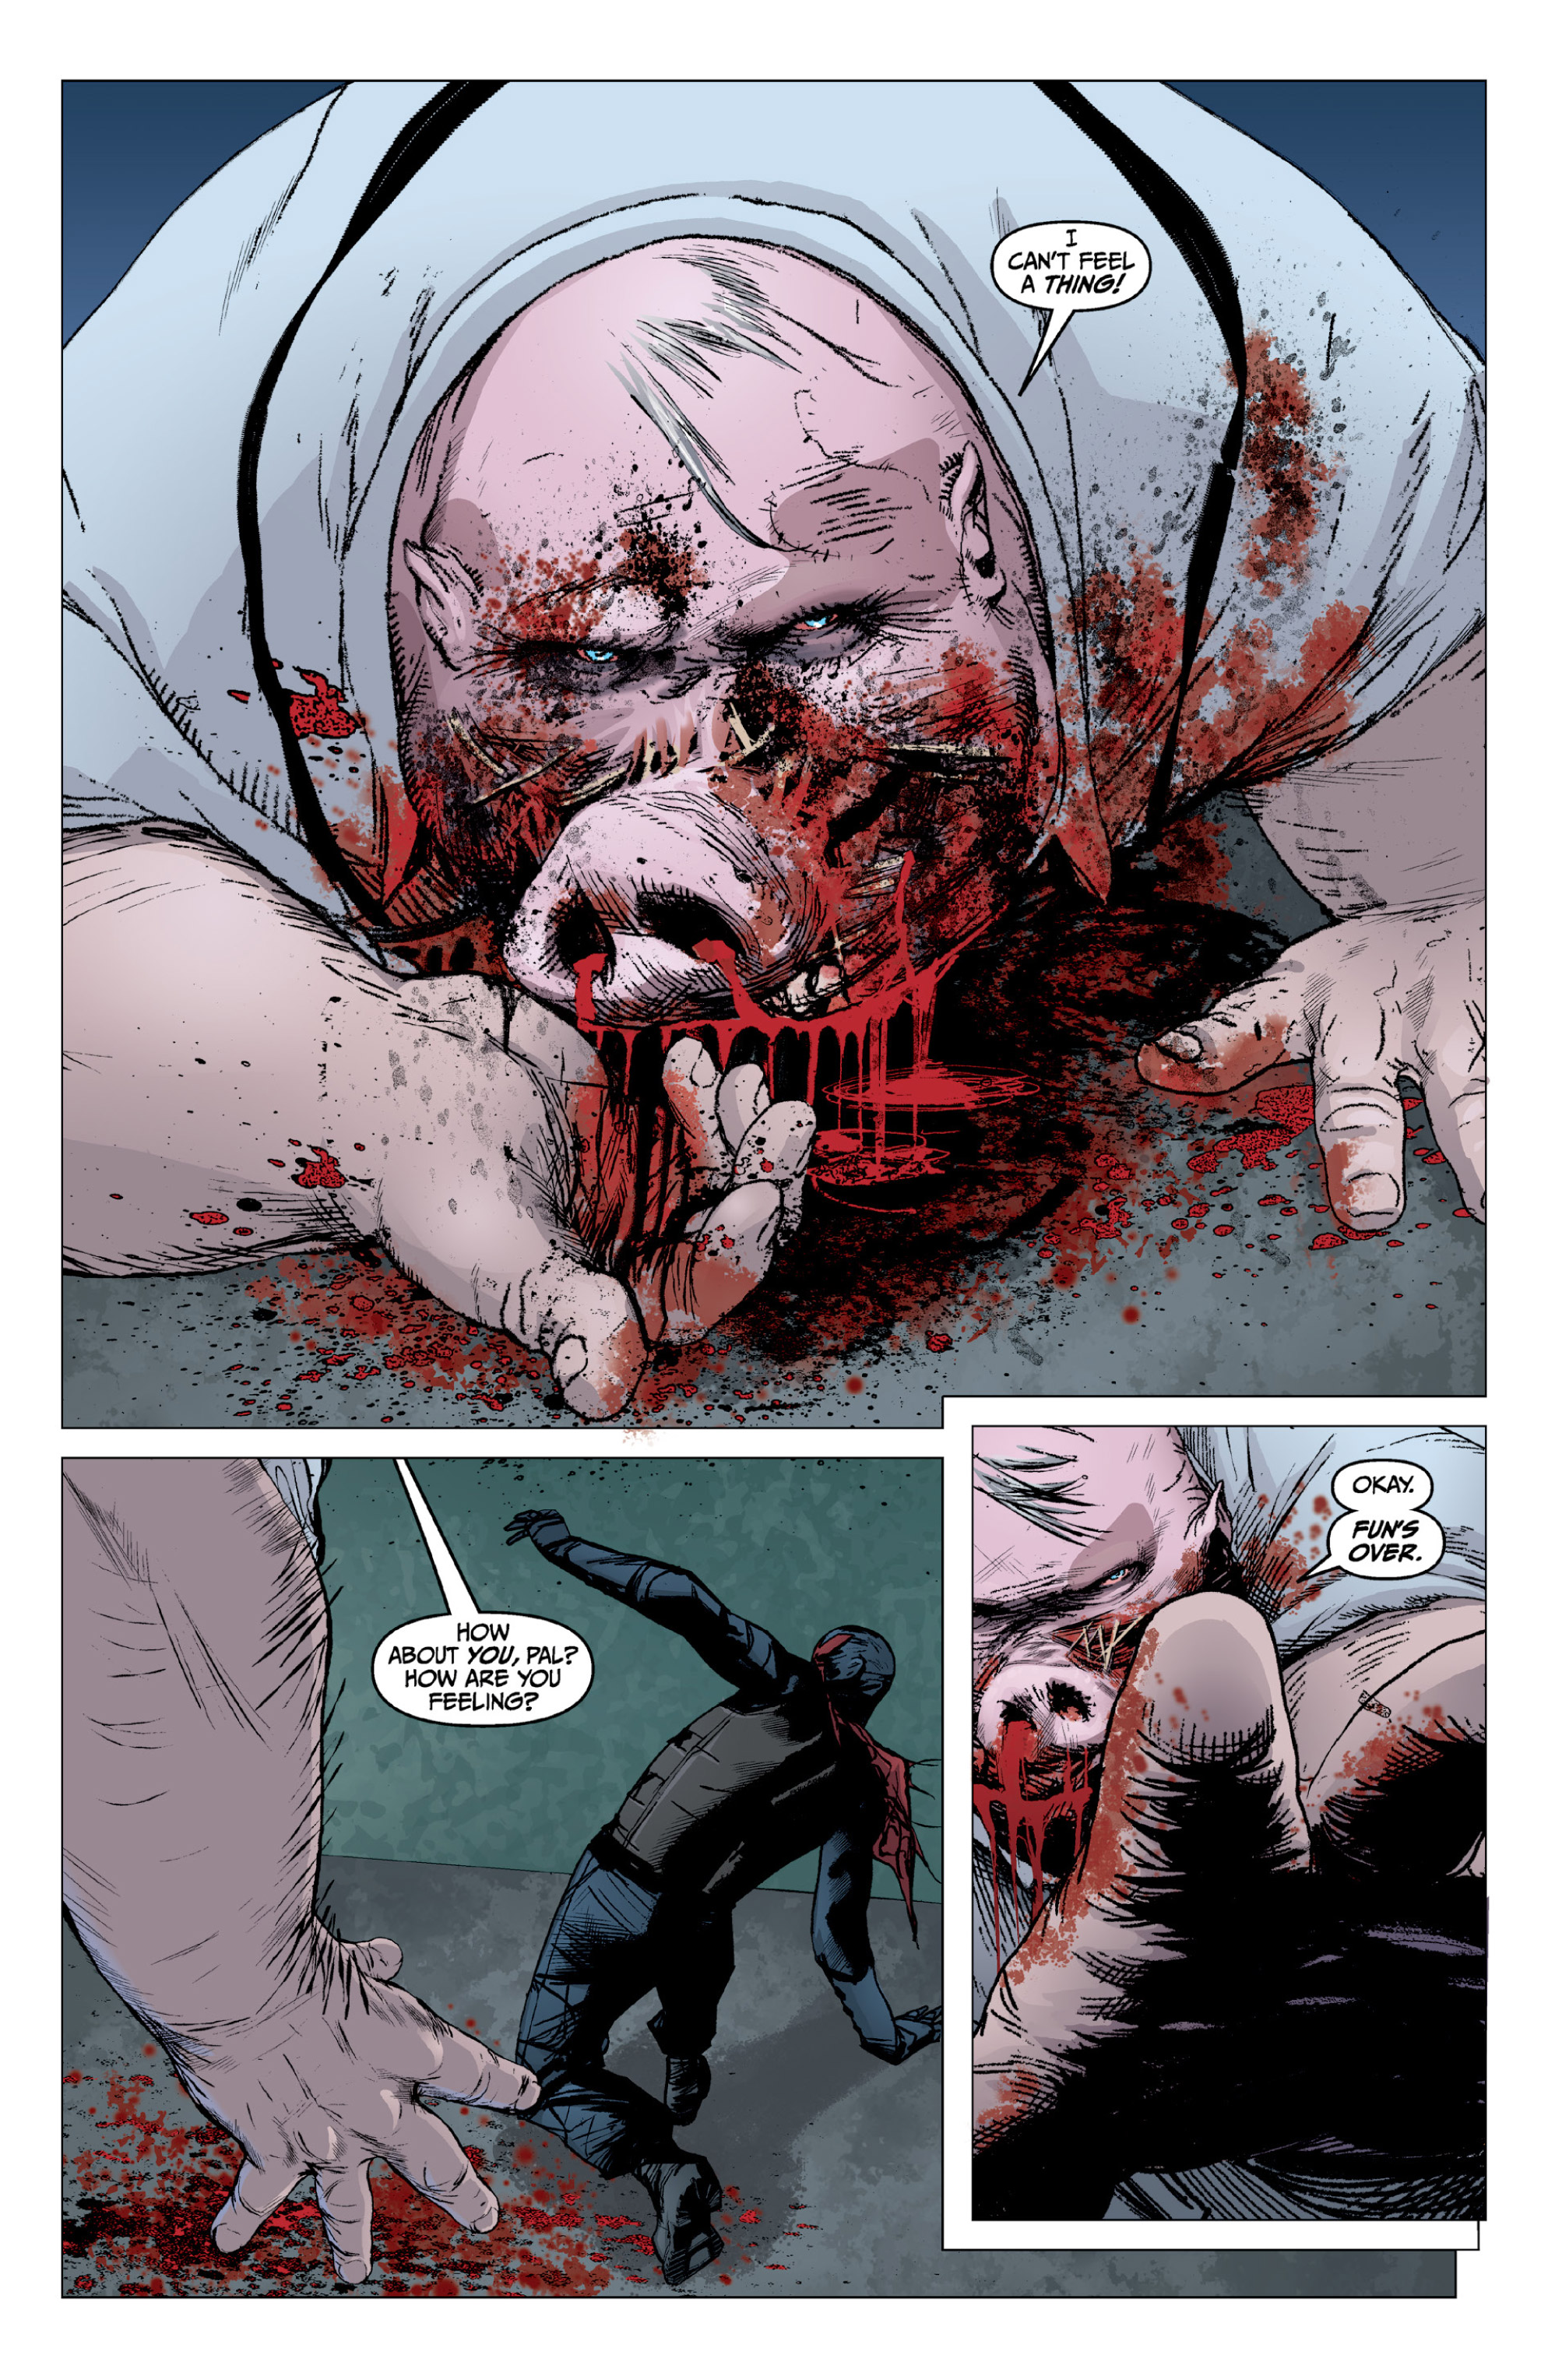 Read online X: Big Bad comic -  Issue # Full - 112